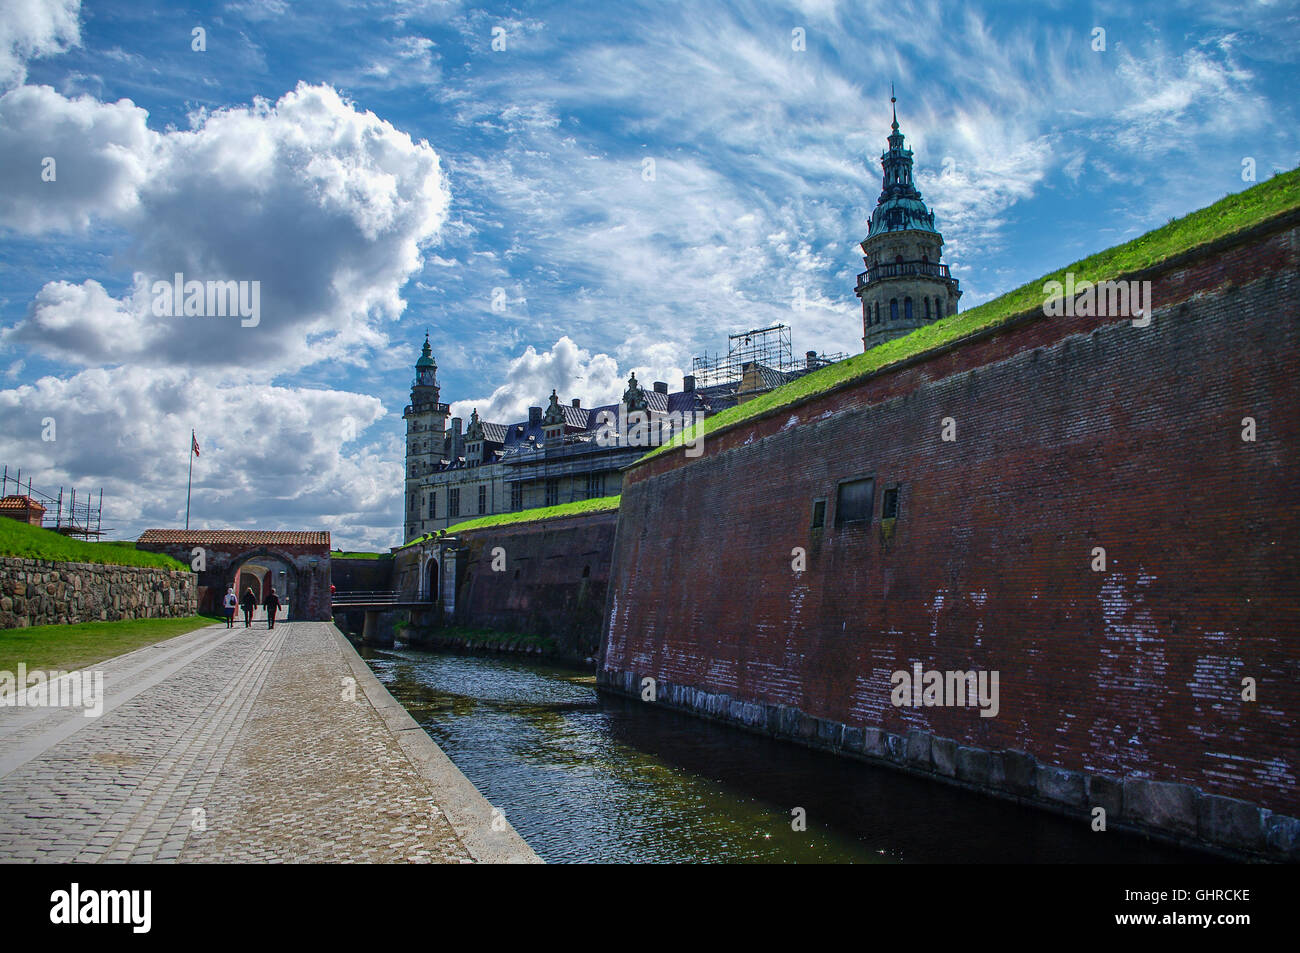 Castle and fortoress of Kronborg, home of Shakespeare's Hamlet. Denmark - Stock Image